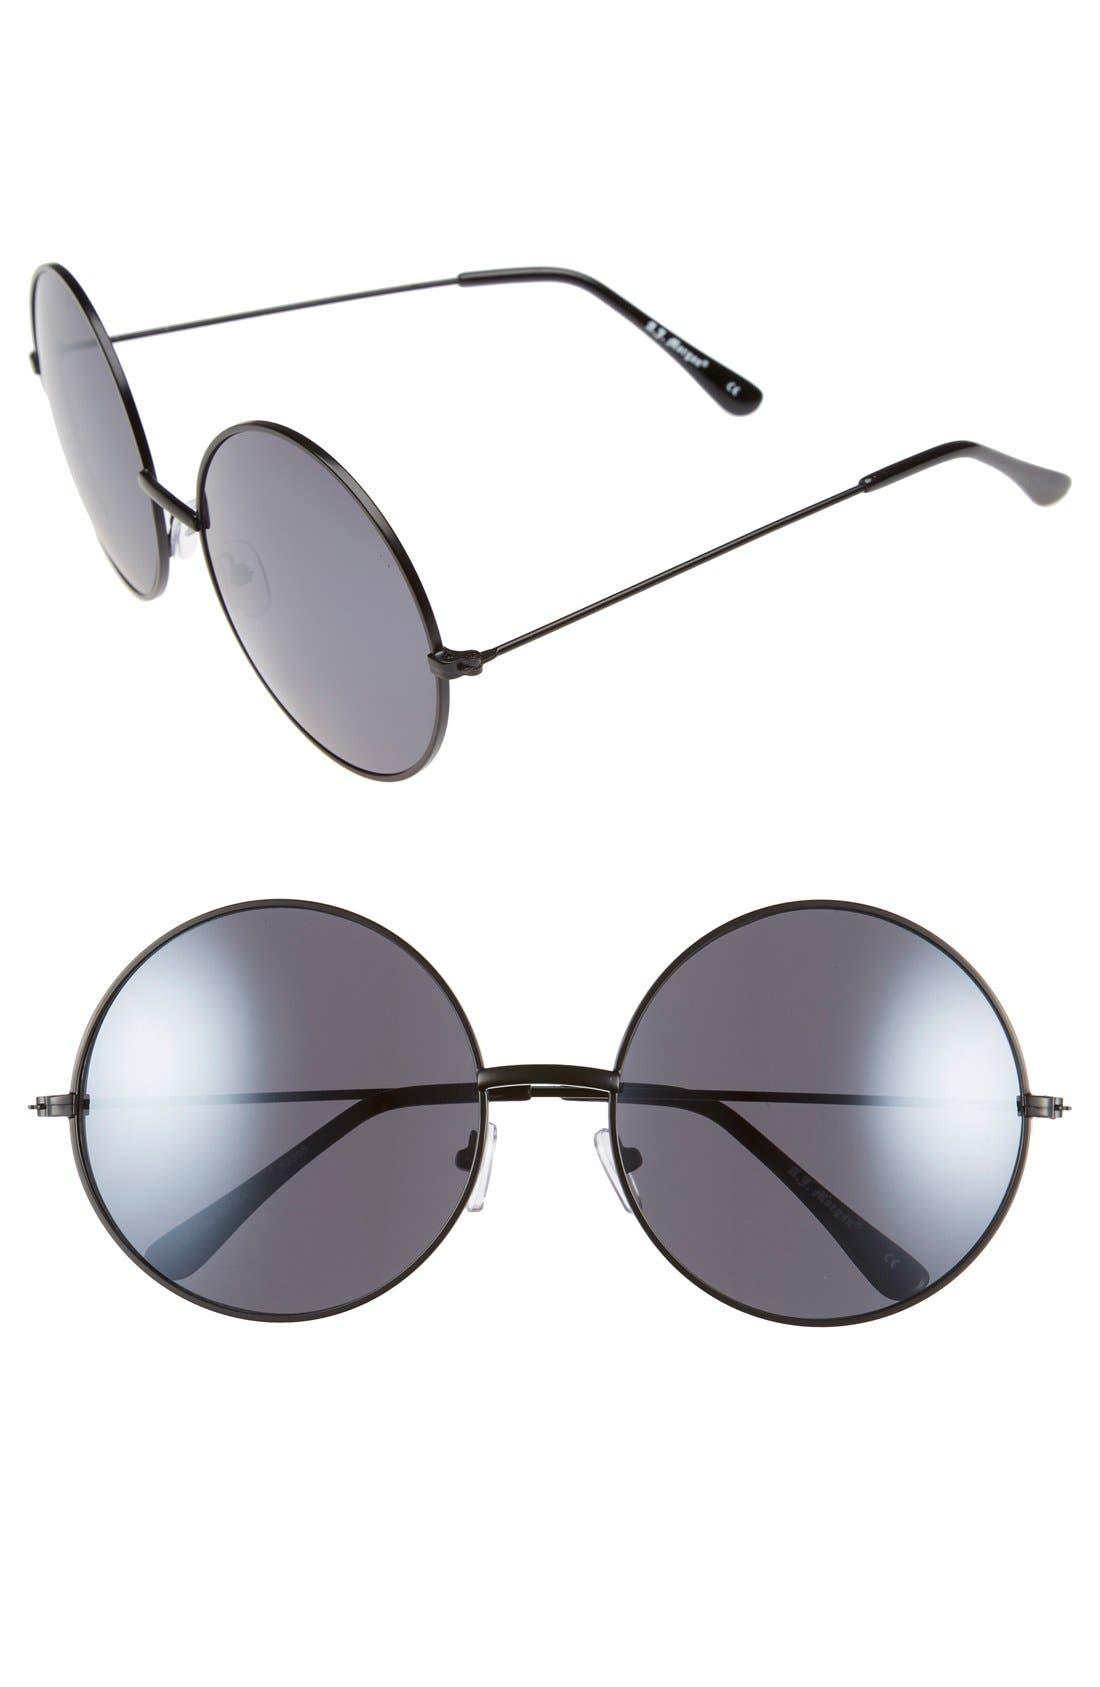 Alternate Image 1 Selected - A.J. Morgan 'Moonies' 61mm Round Sunglasses